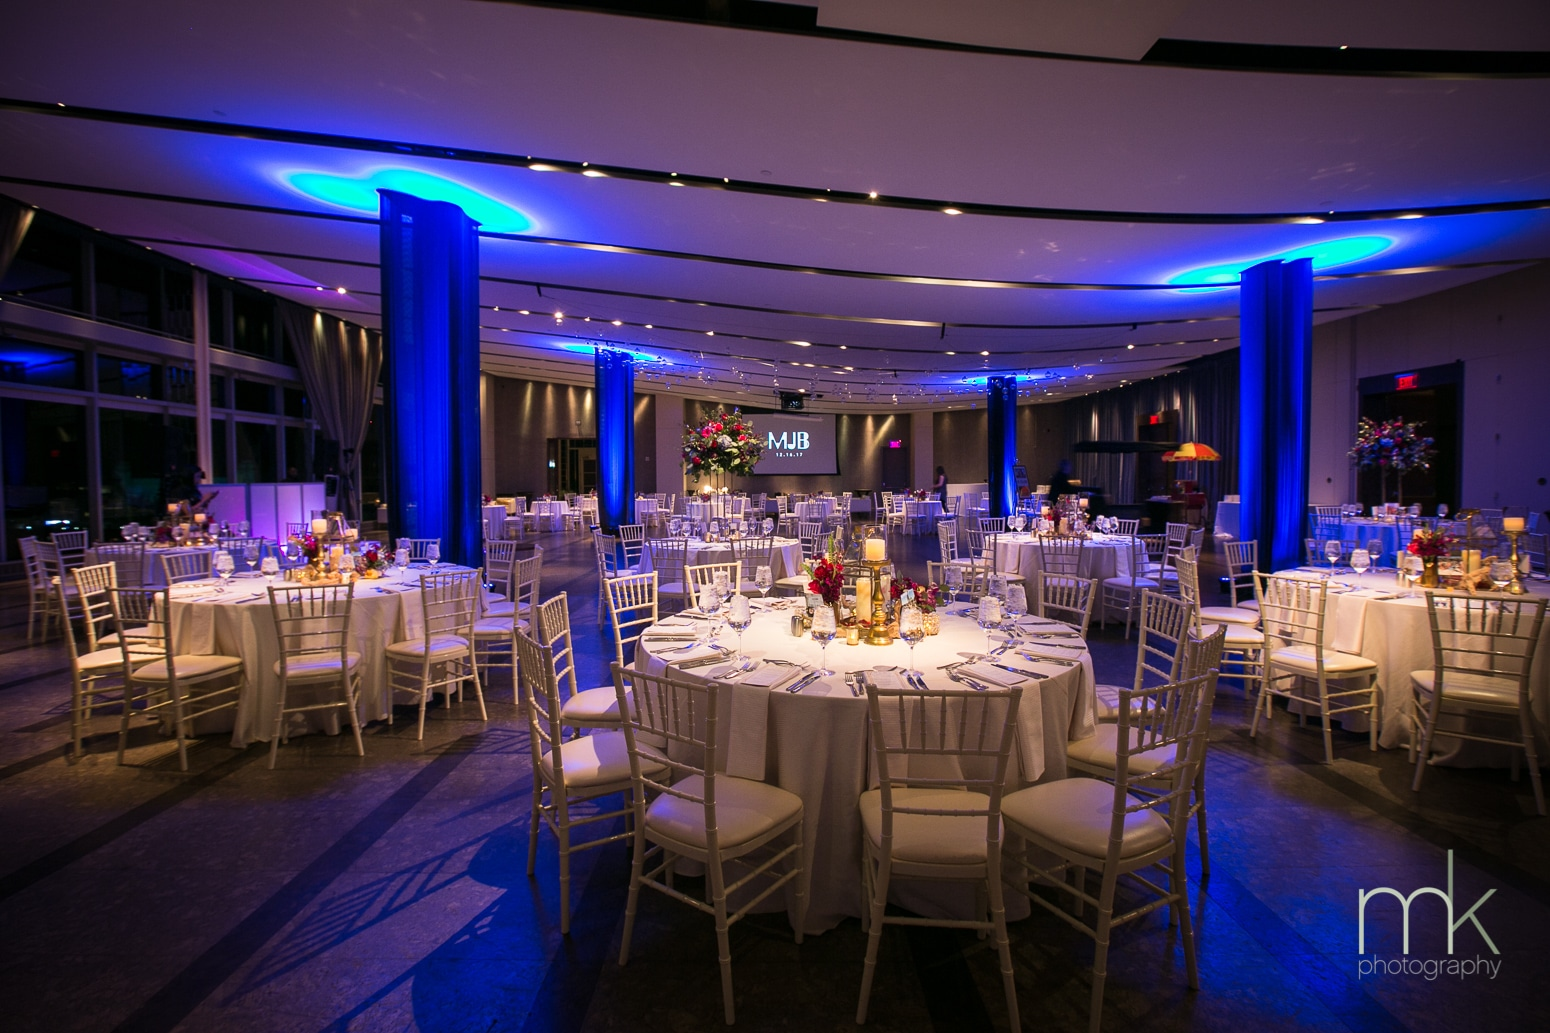 Atlantic Room with chivari chairs - Venue Gallery